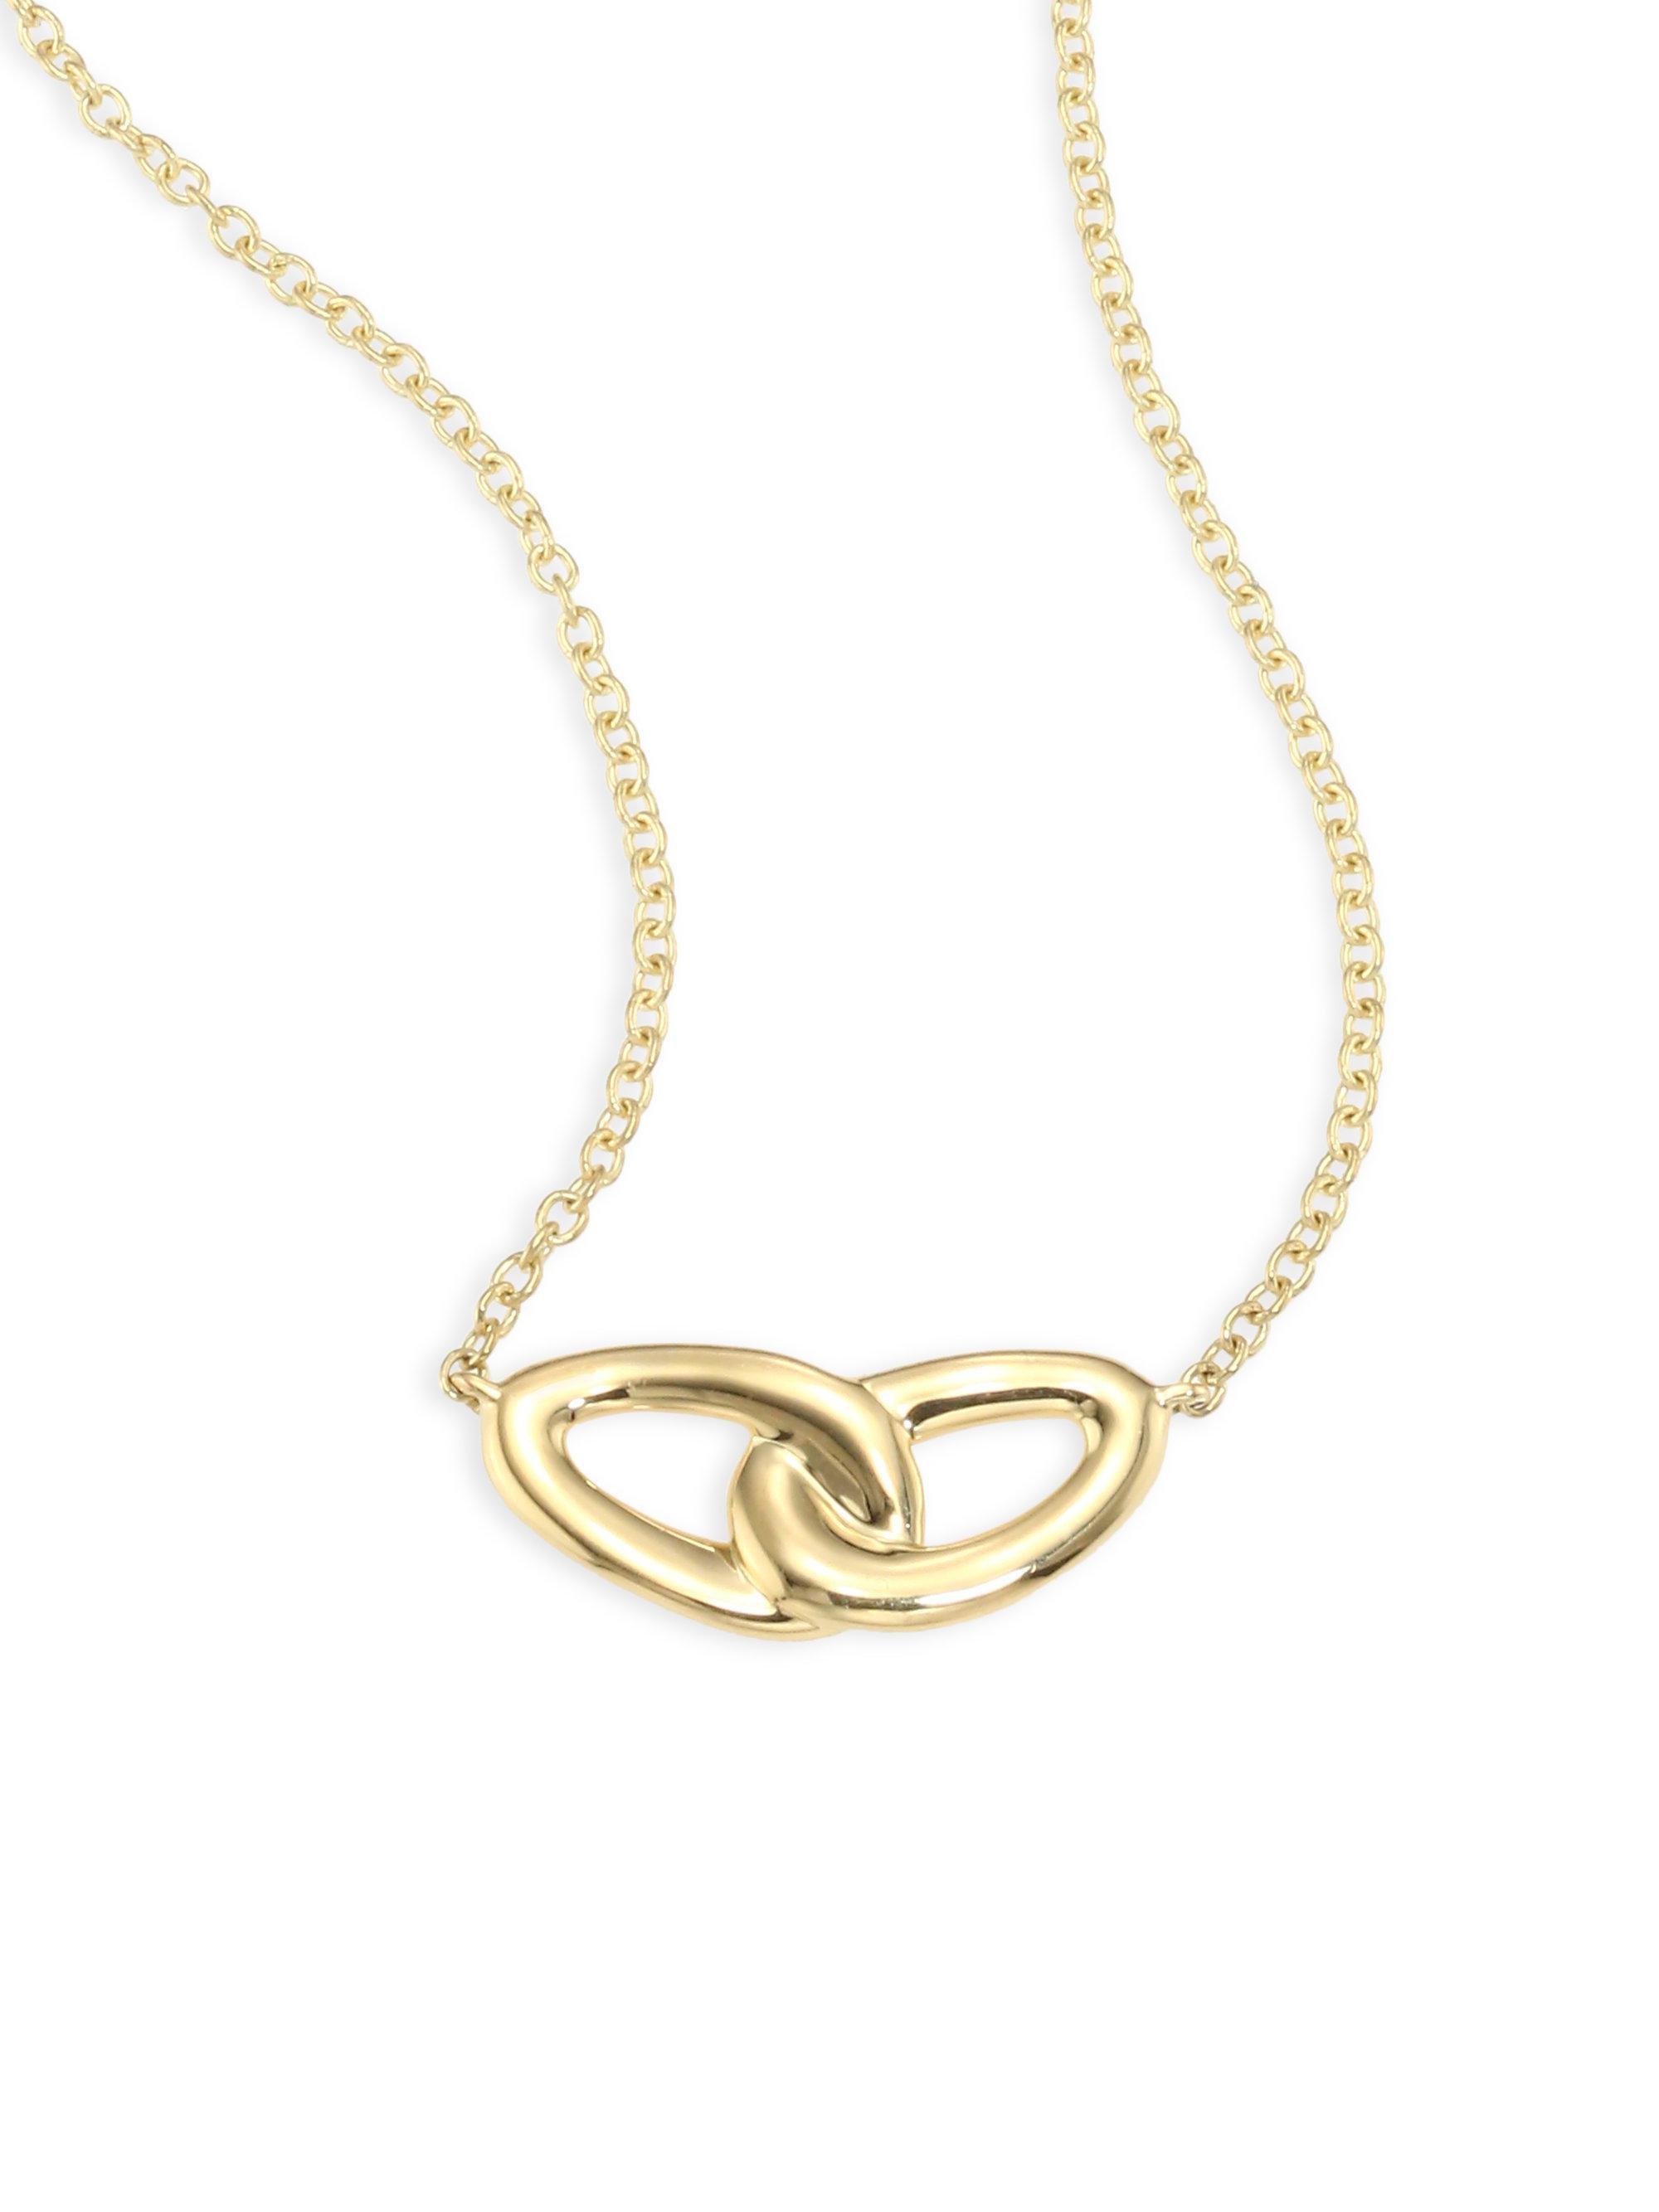 Ippolita 18K Cherish Link Necklace MwMeDd4s